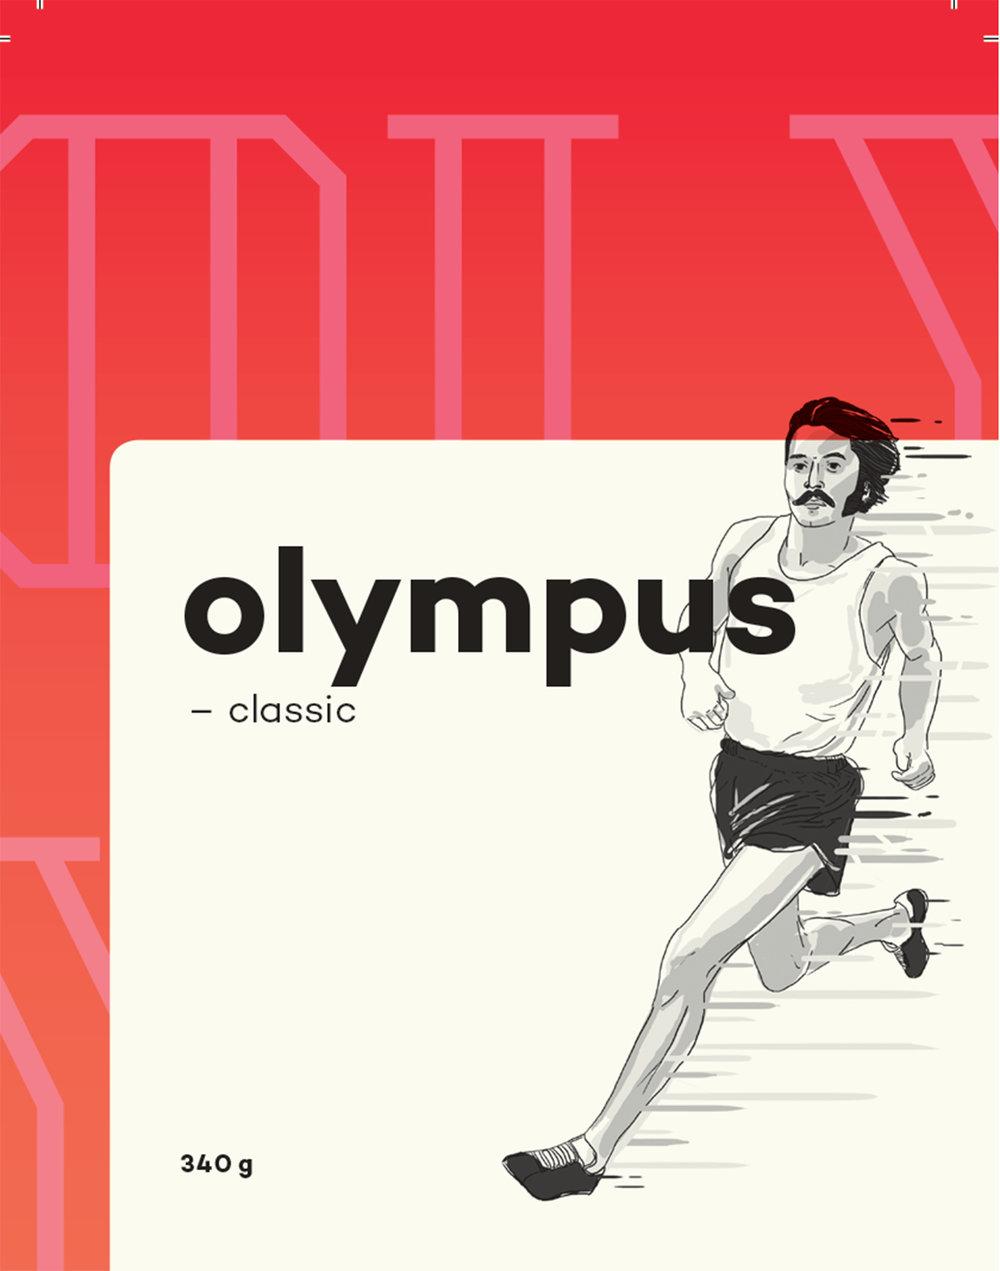 OLYMPUS-LABEL.jpg